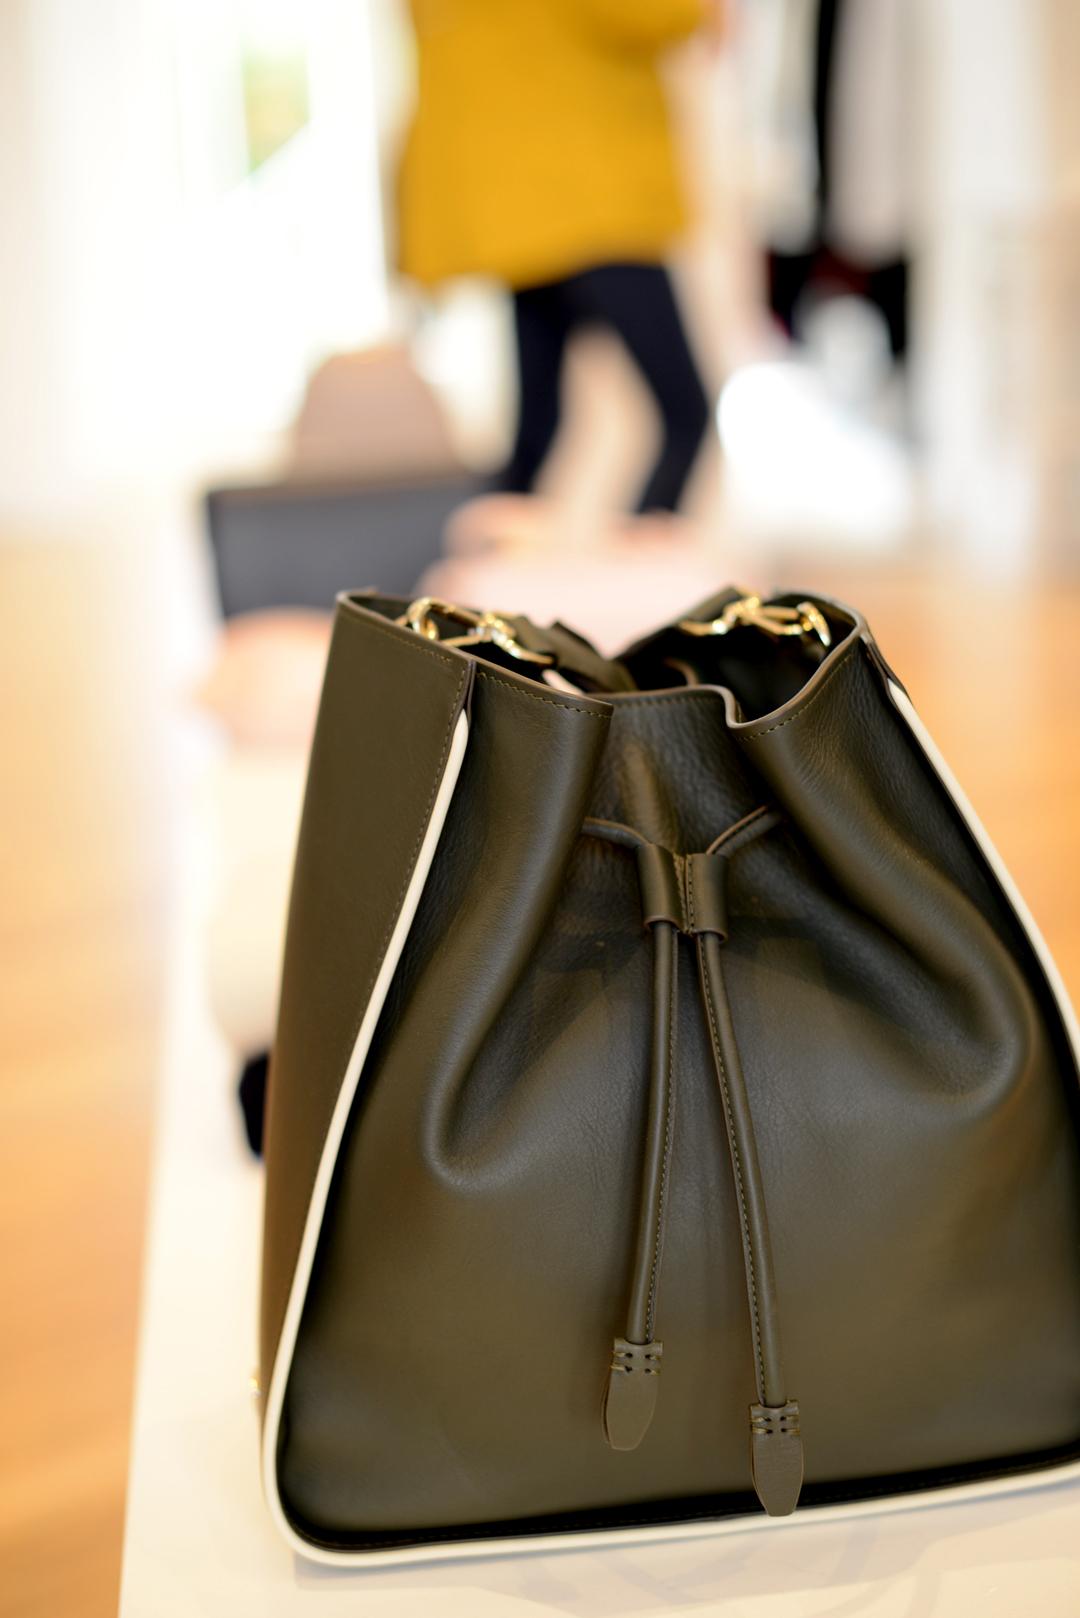 me + em shop in elizabeth street photographed by stylist and fashion blogger sara delaney